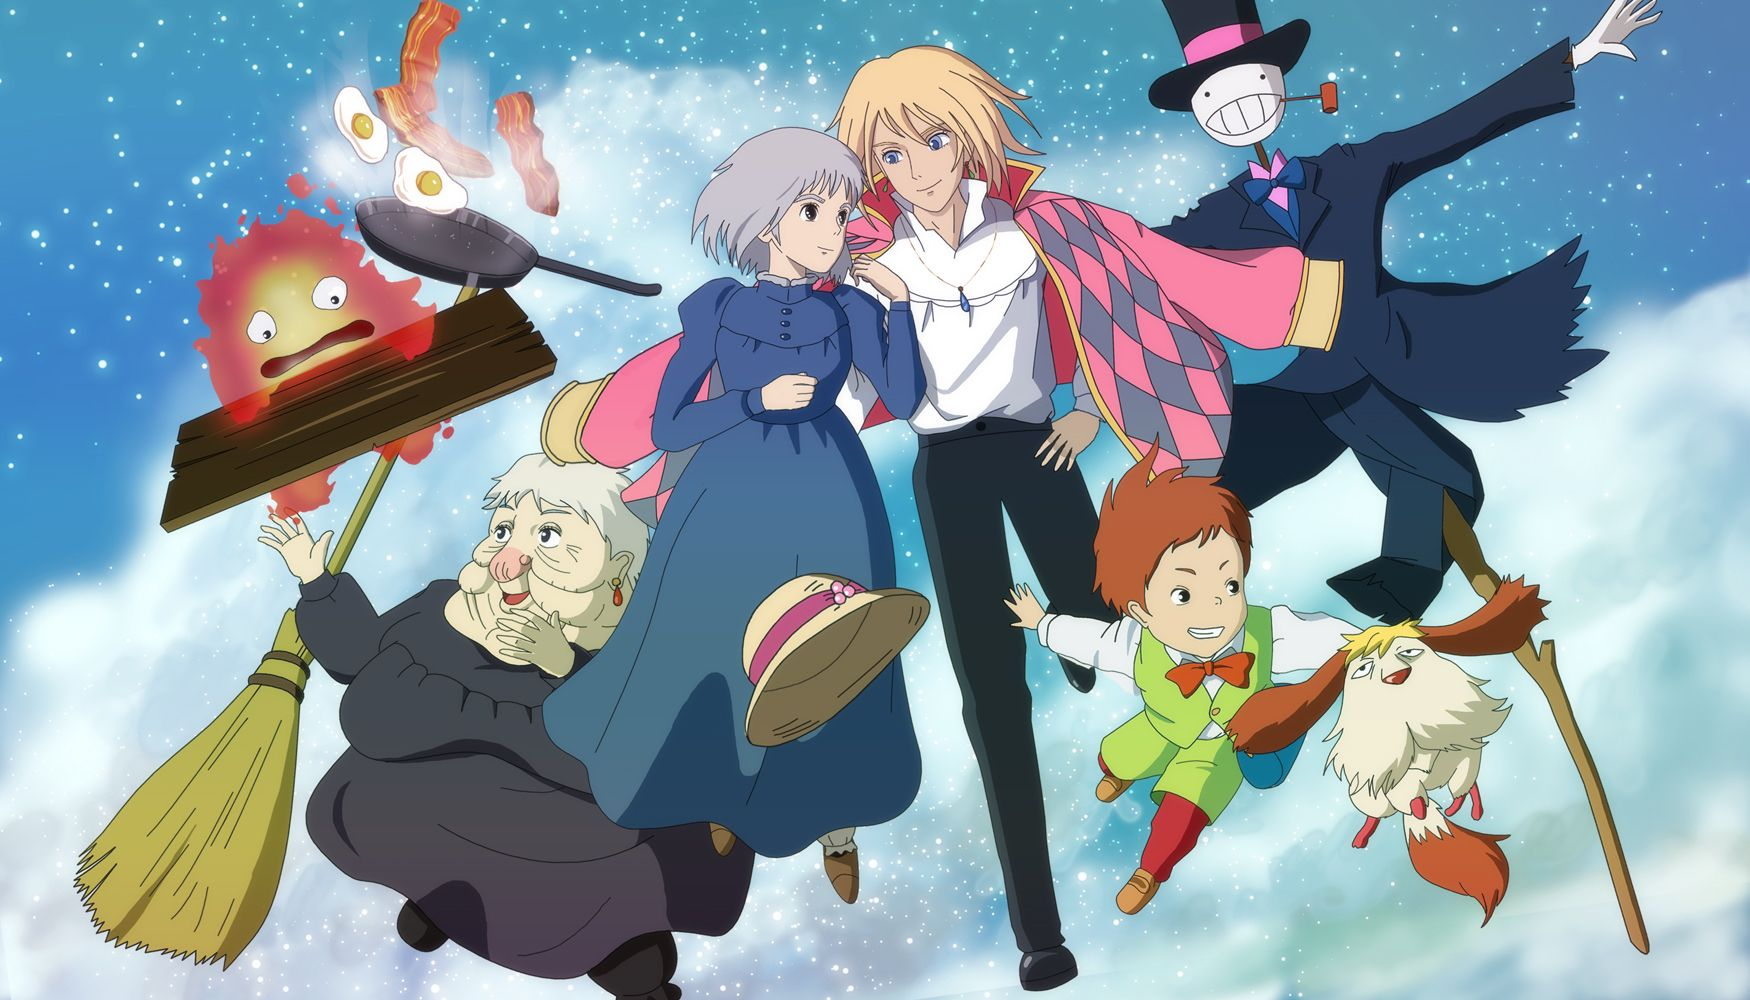 Pin De Sophie Loves Pickles En Studio Ghibli Ã'¹ã'¿ã'¸ã'ªã'¸ãƒ–リ El Castillo Ambulante Howl El Castillo Ambulante Personajes Studio Ghibli